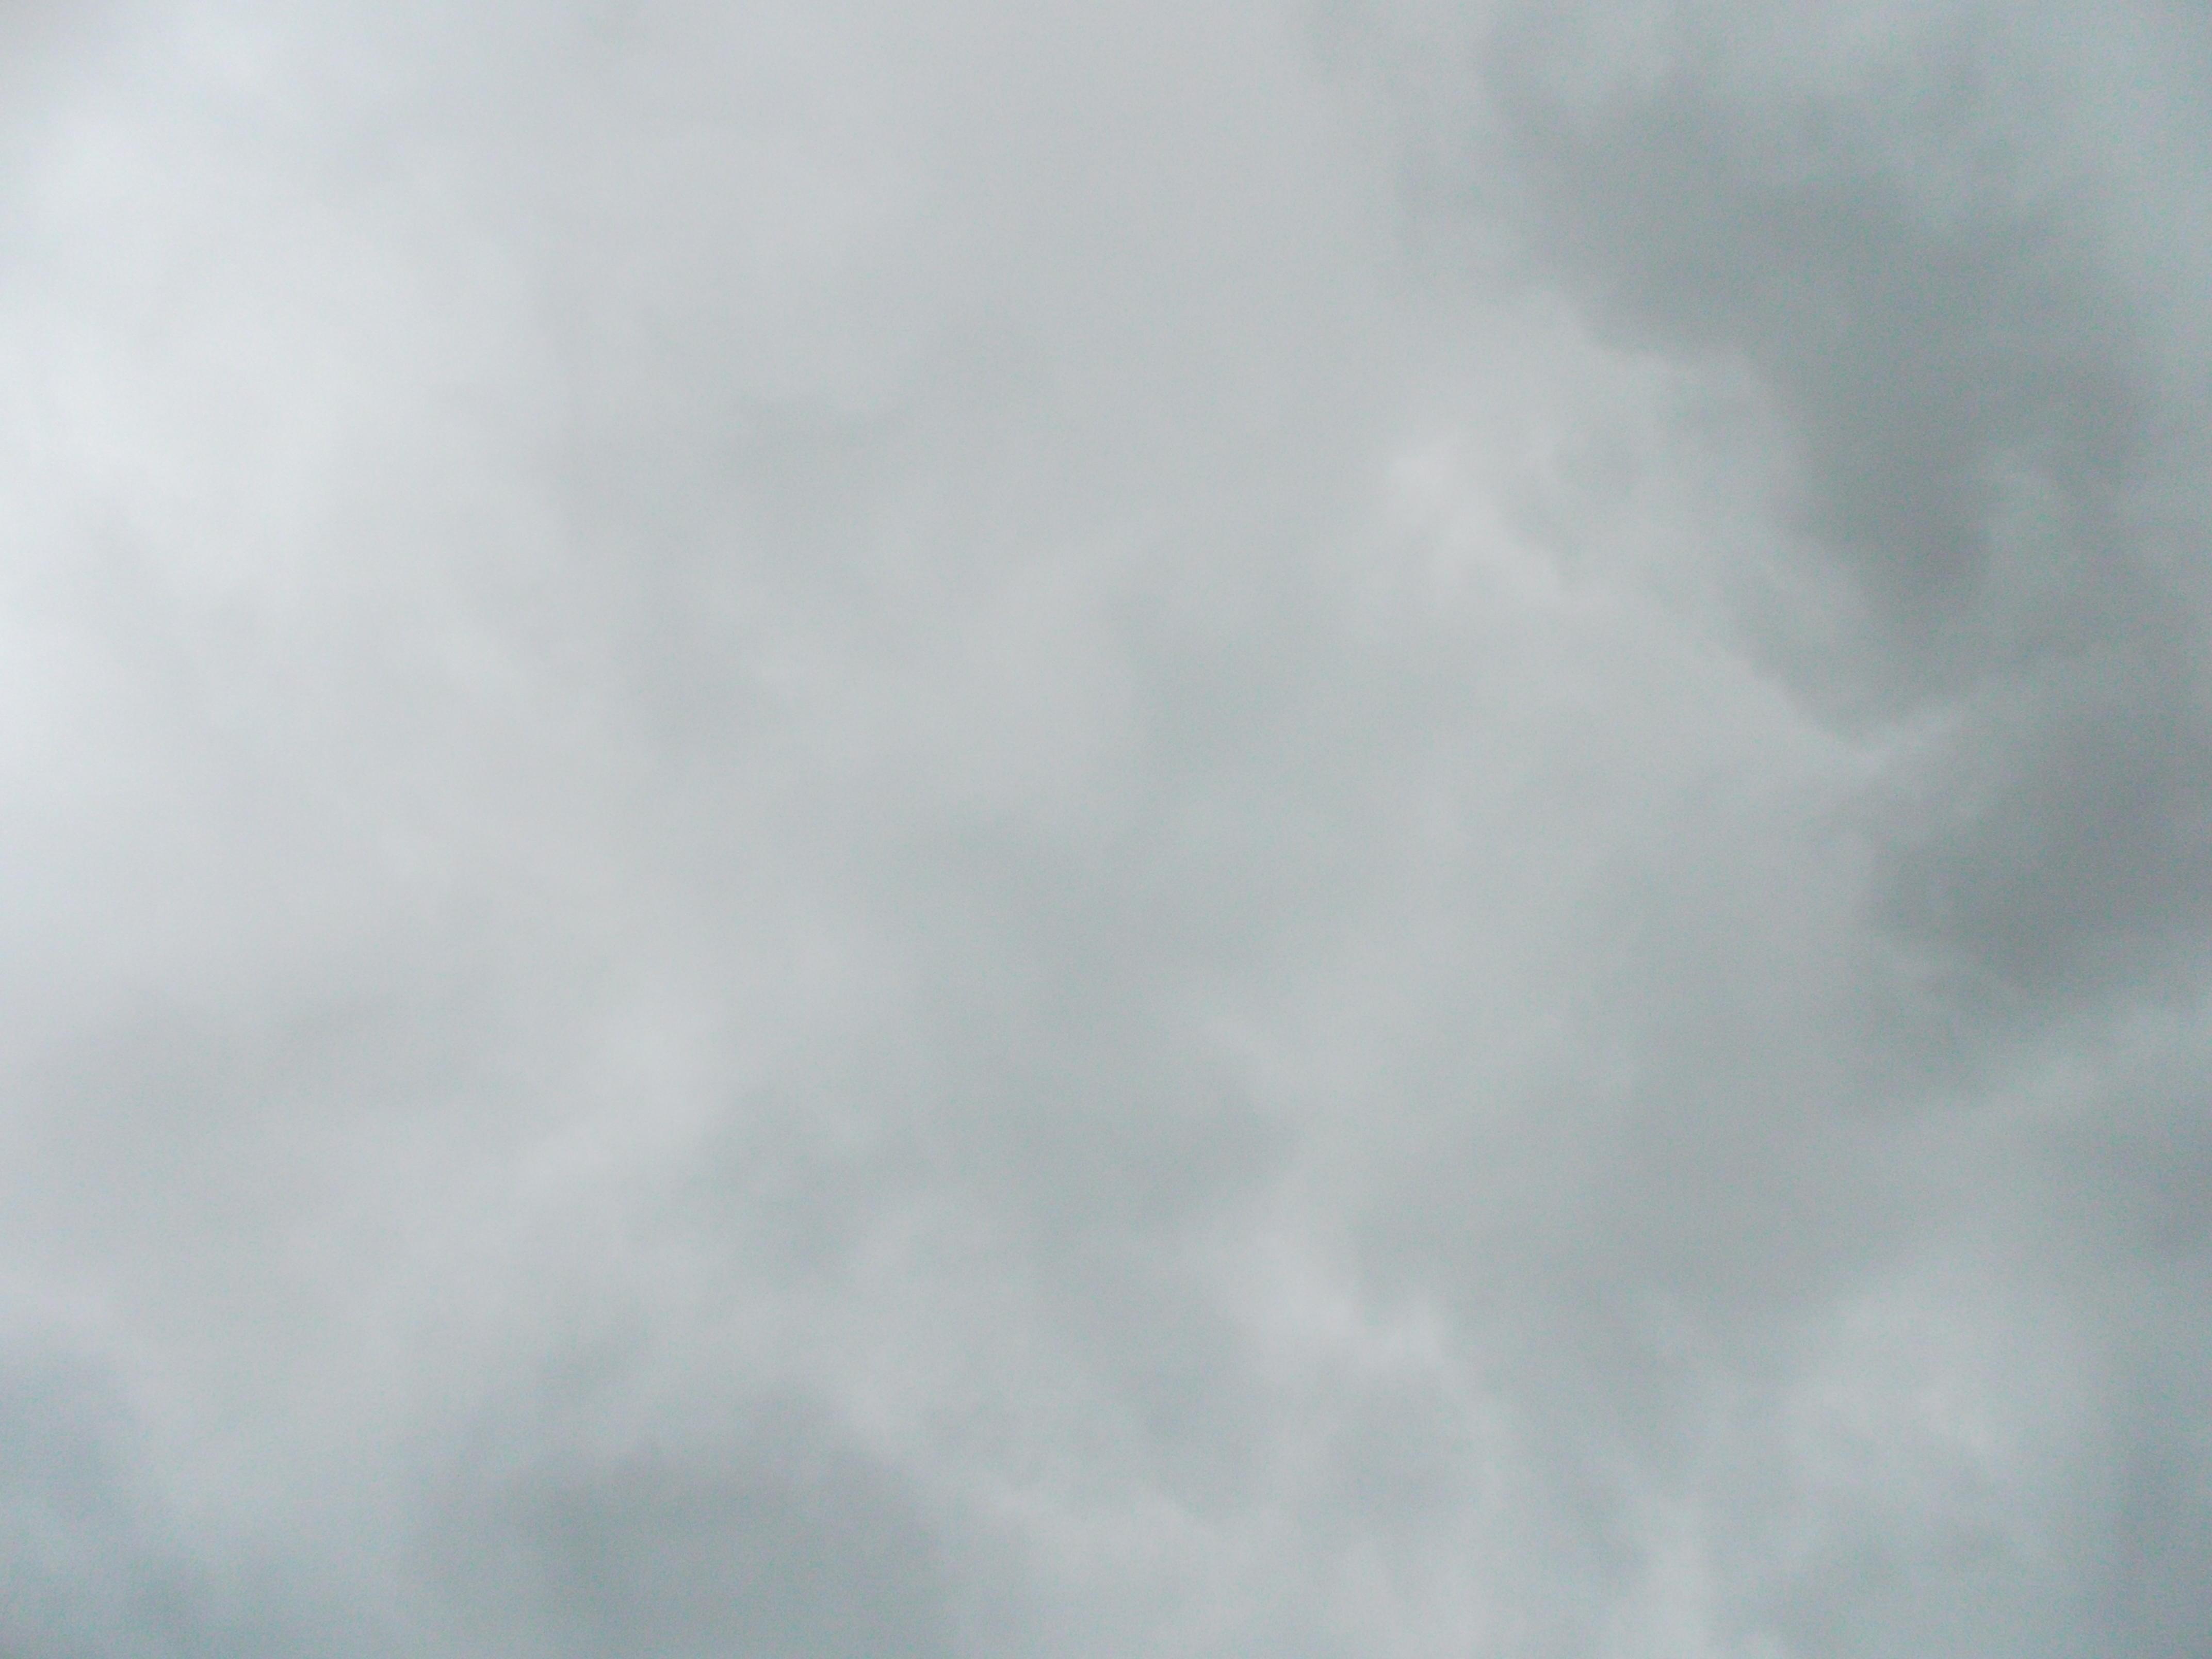 2013-05-12 Longitude -0.371 Latitude 49.182 Altitude 29 Heure 15h55